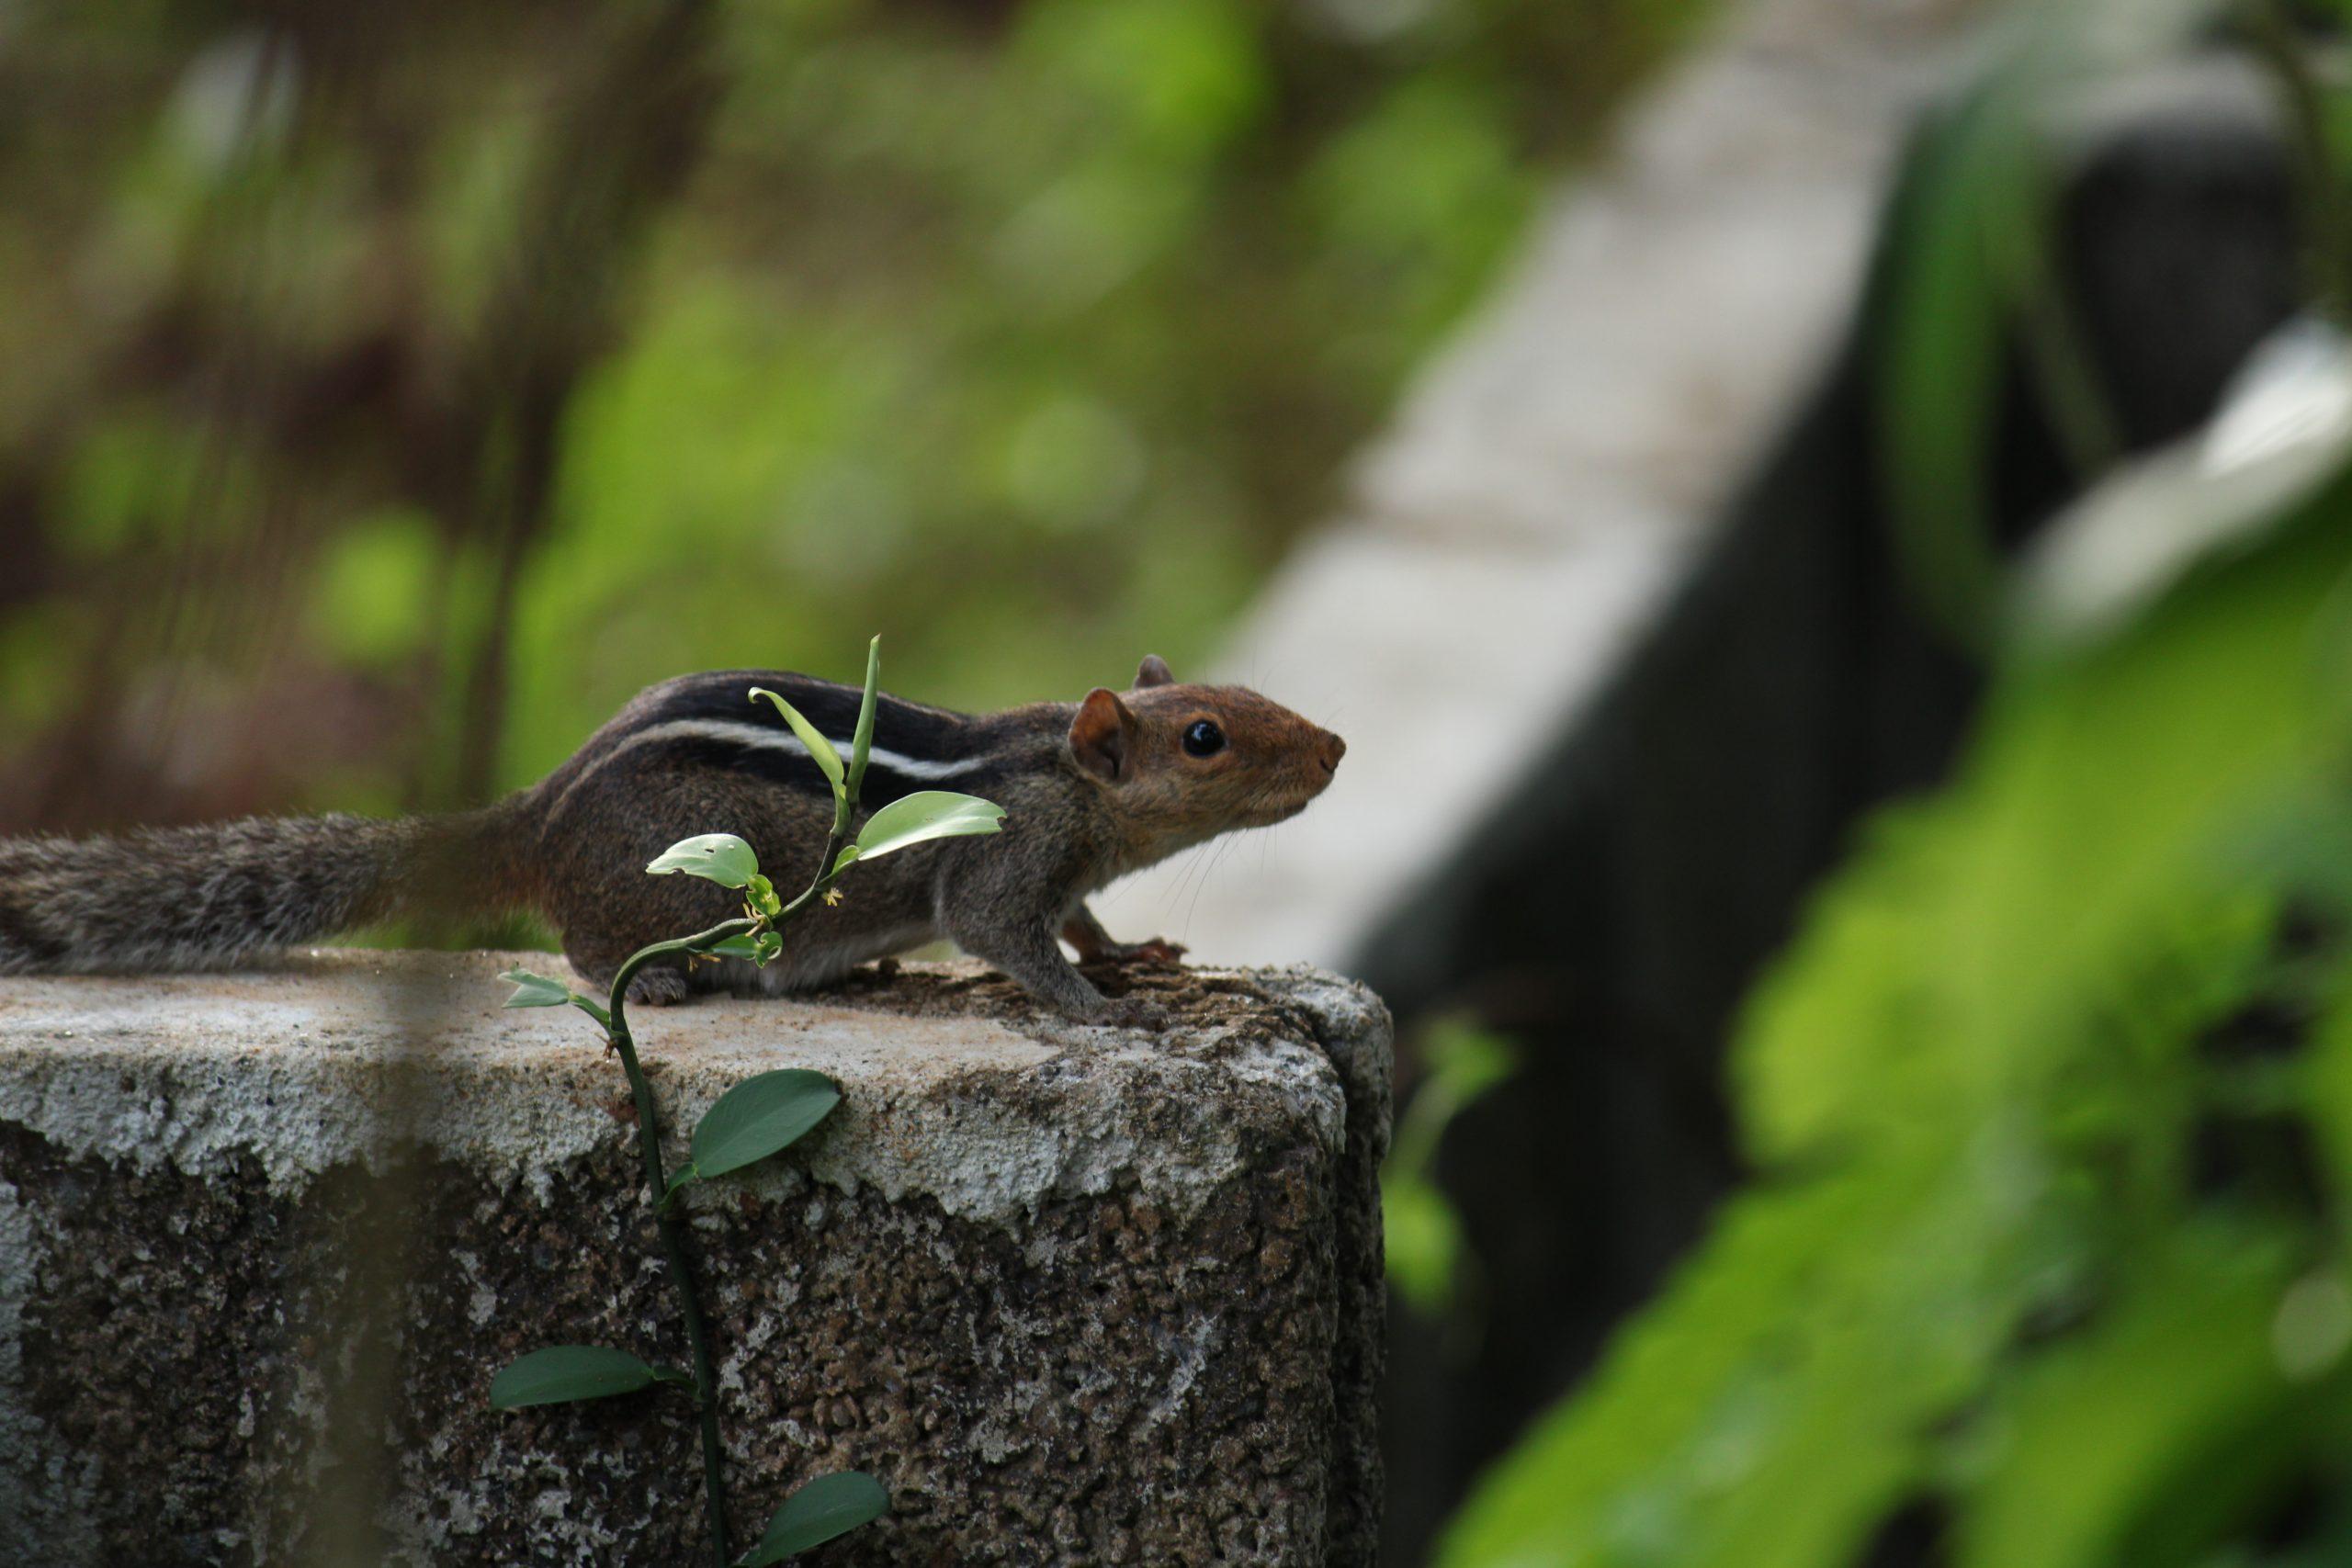 squirrel on a ledge